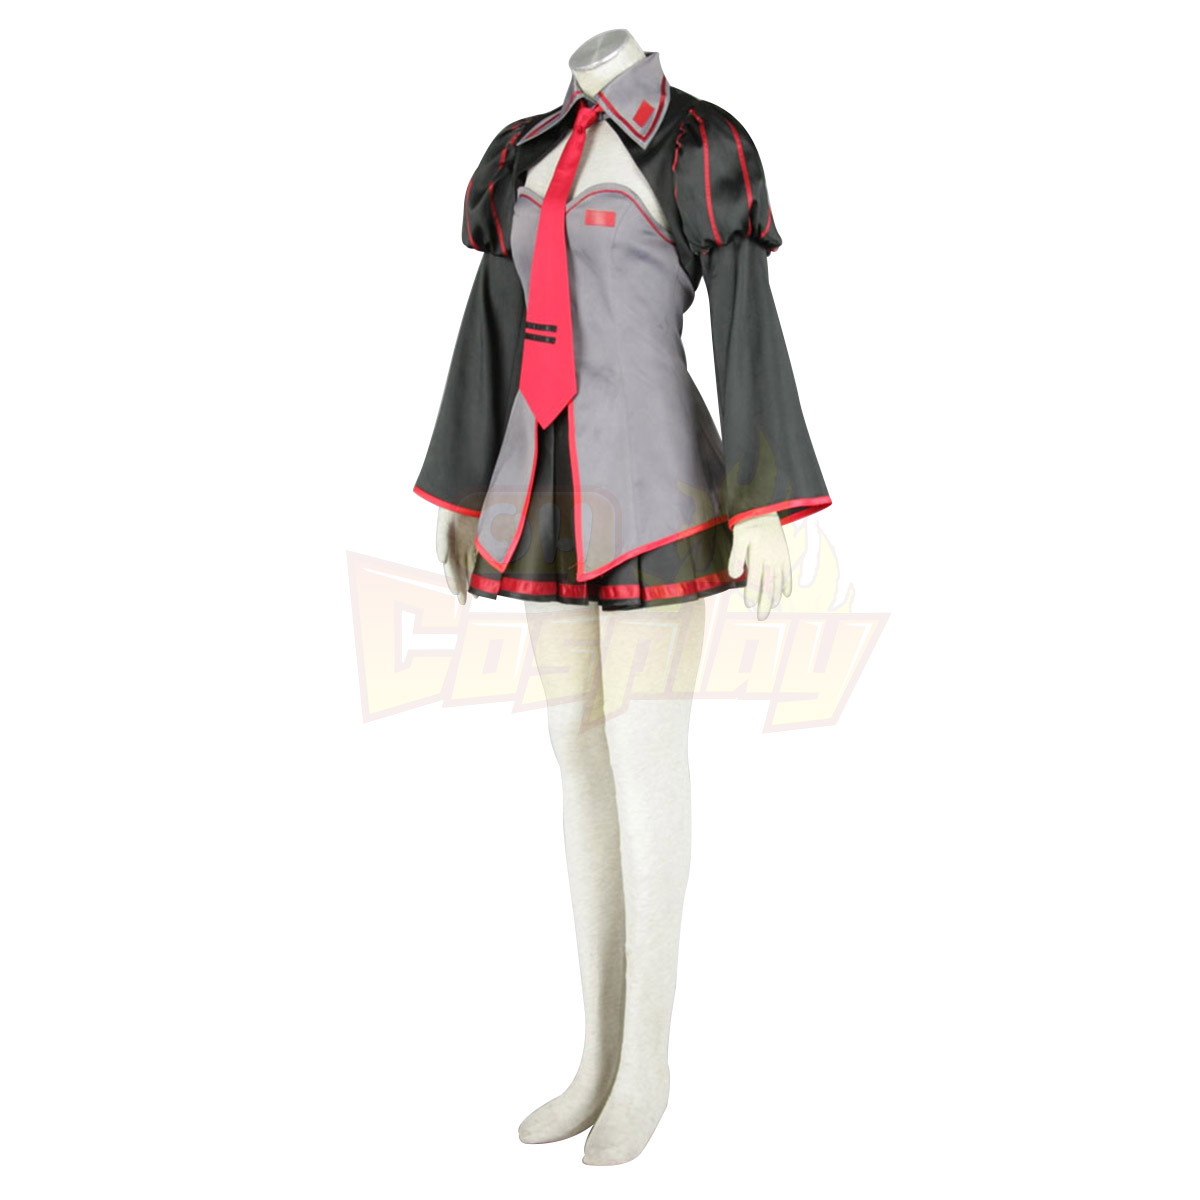 Fantasias Vocaloid Zatsune Miku 1 Trajes Cosplay